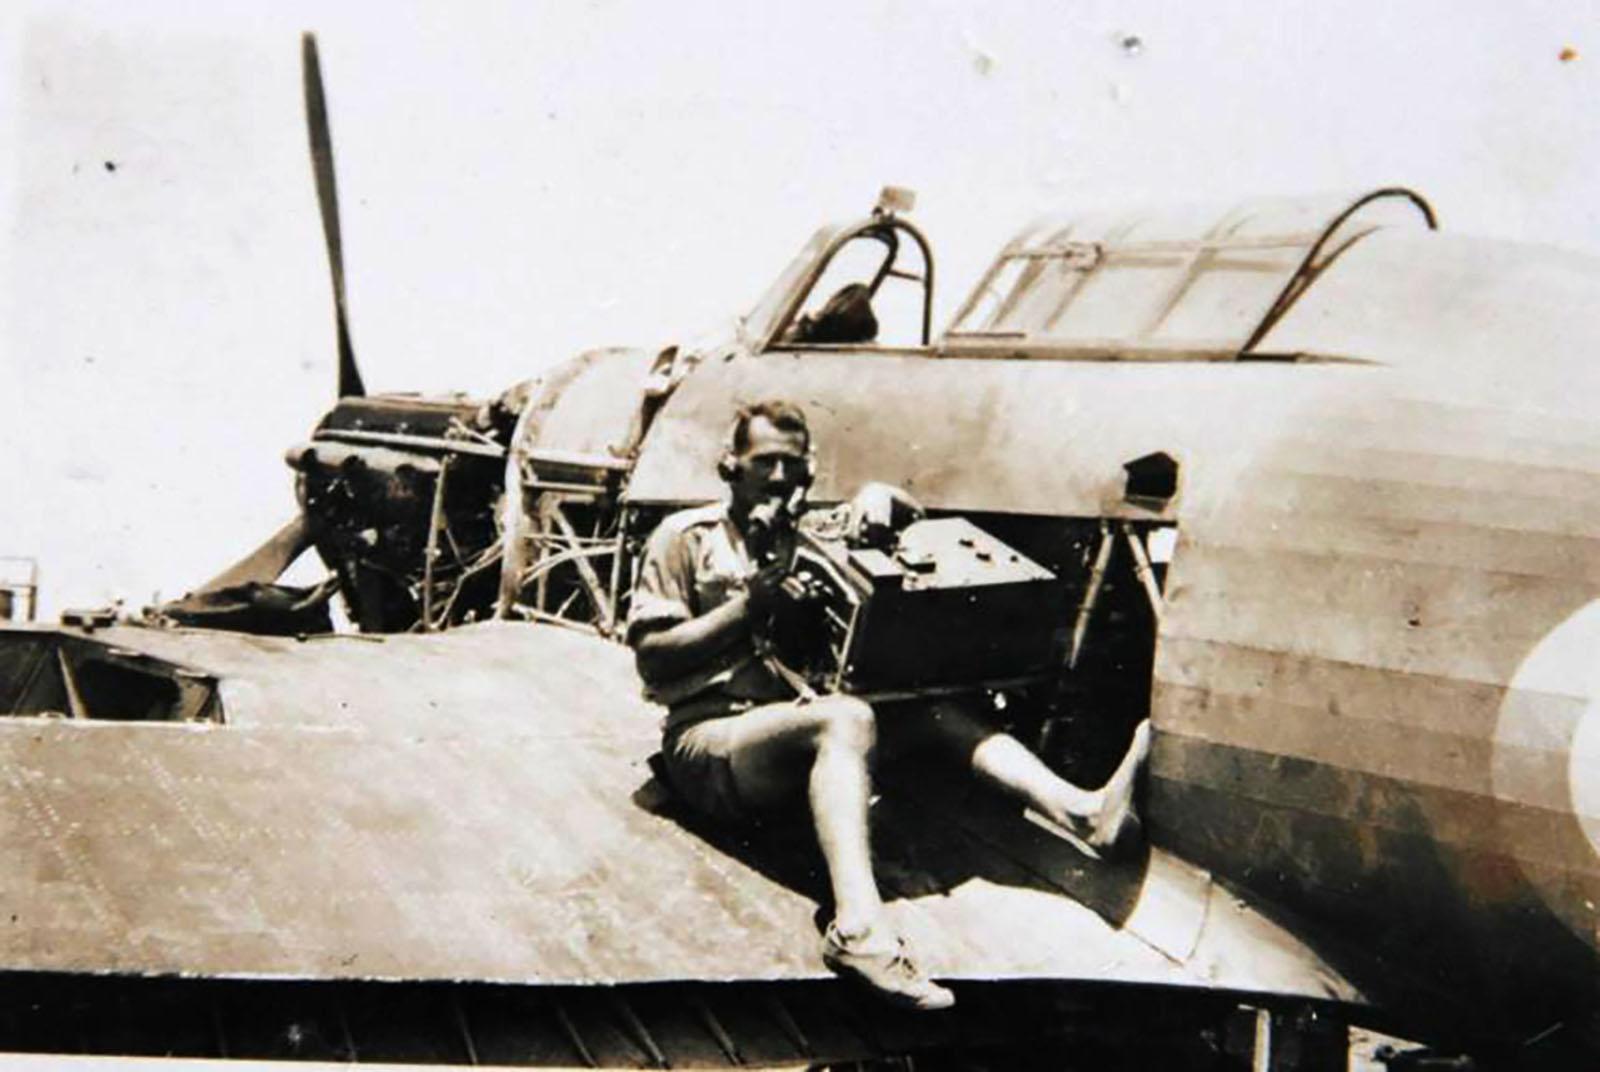 Hurricane I Trop SAAF 3Sqn U Bob Kershaw Dagahbur Ethiopia East Africa March 1941 04